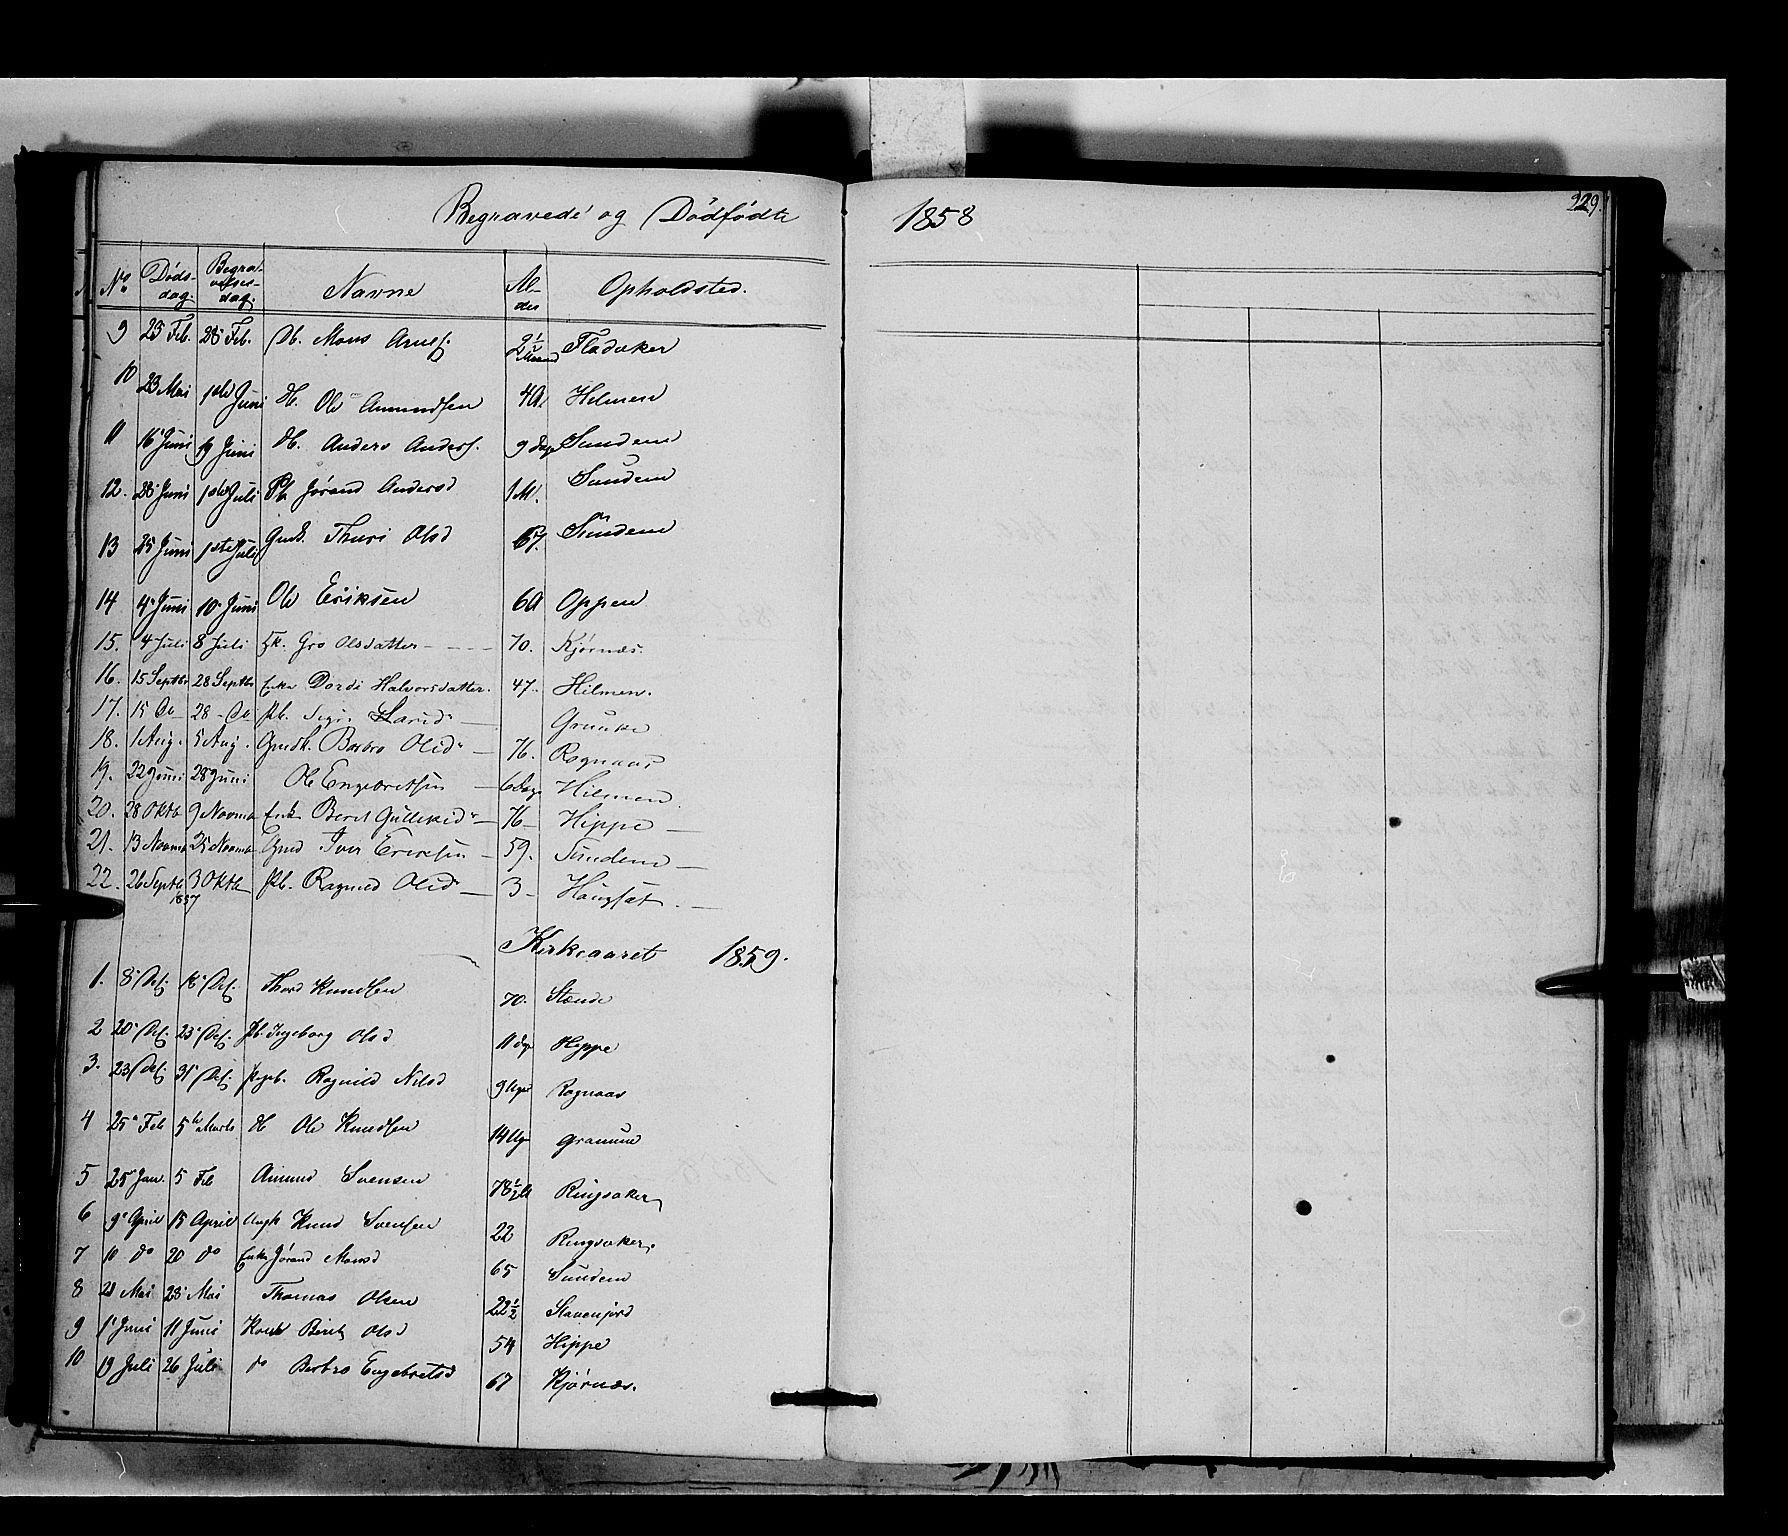 SAH, Nord-Aurdal prestekontor, Ministerialbok nr. 6, 1842-1863, s. 229